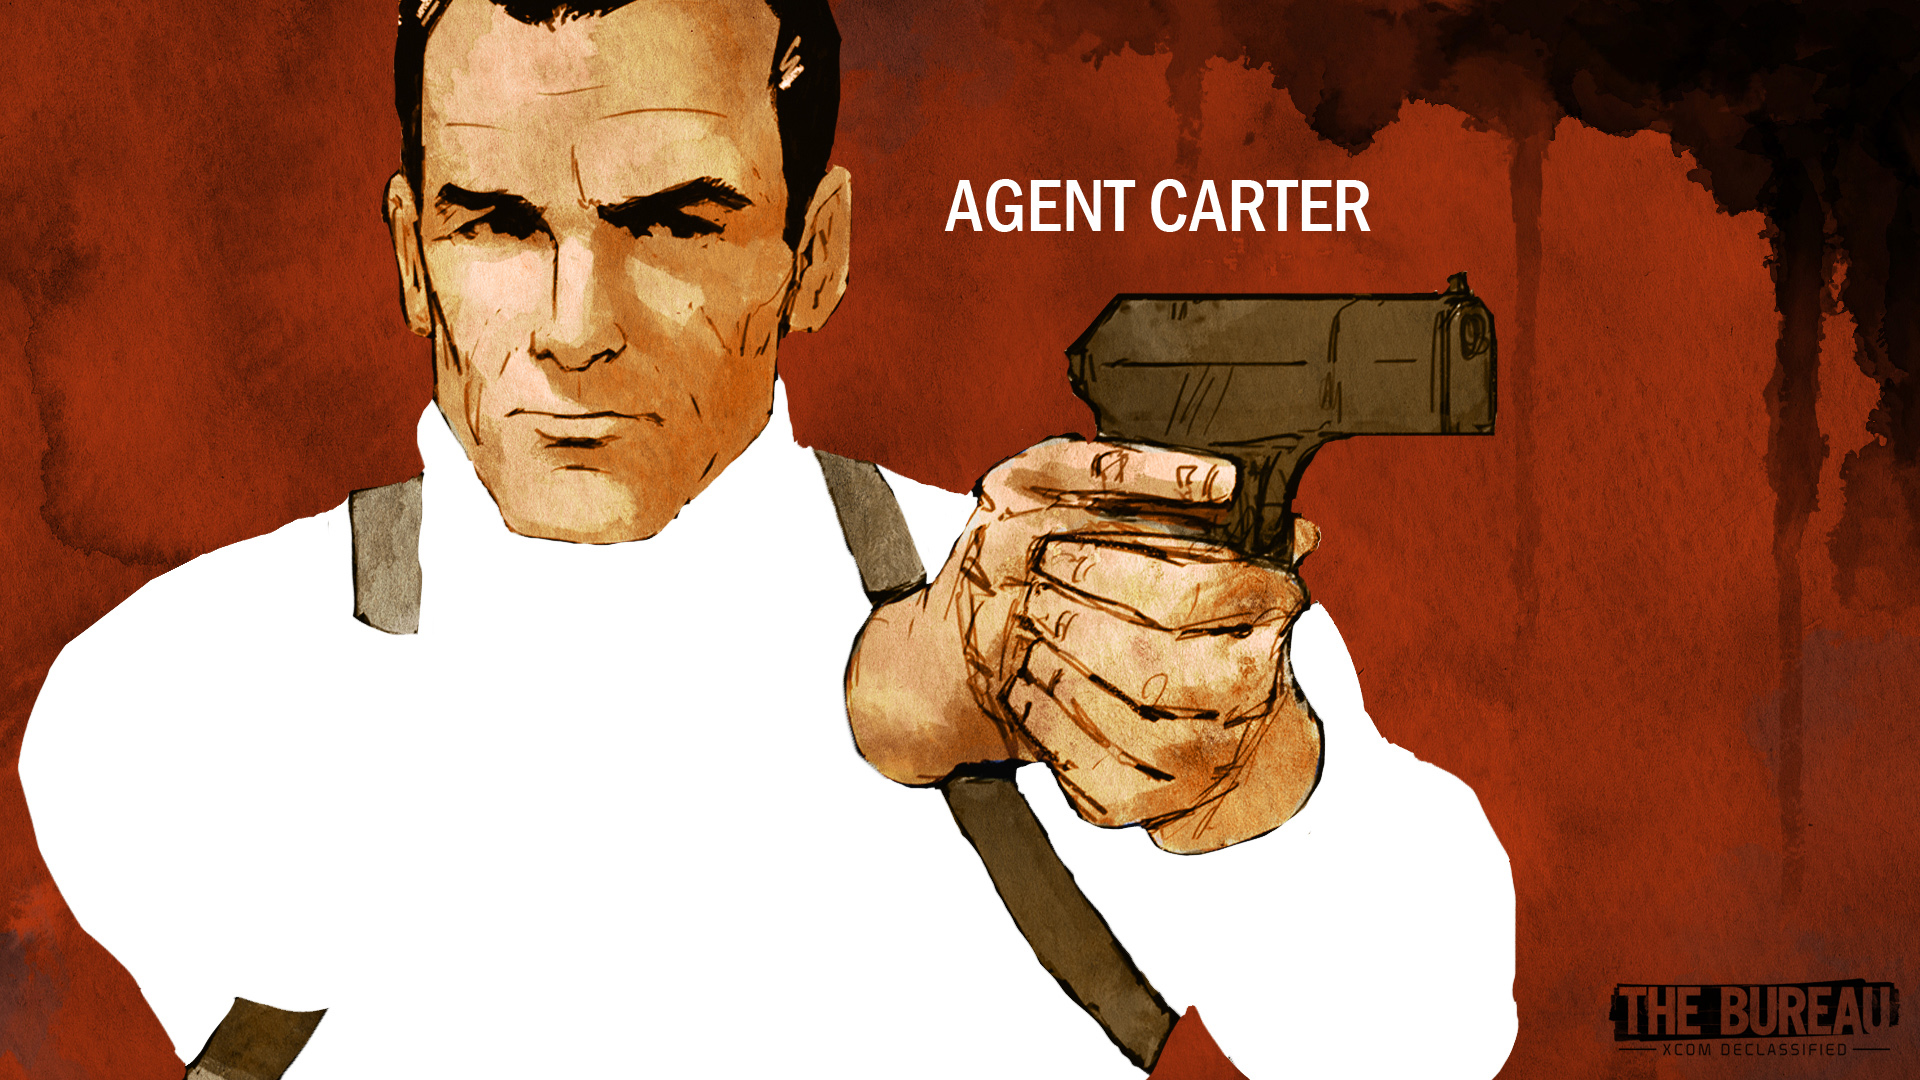 Agent William Carter Wallpaper from The Bureau XCOM Declassified 1920x1080